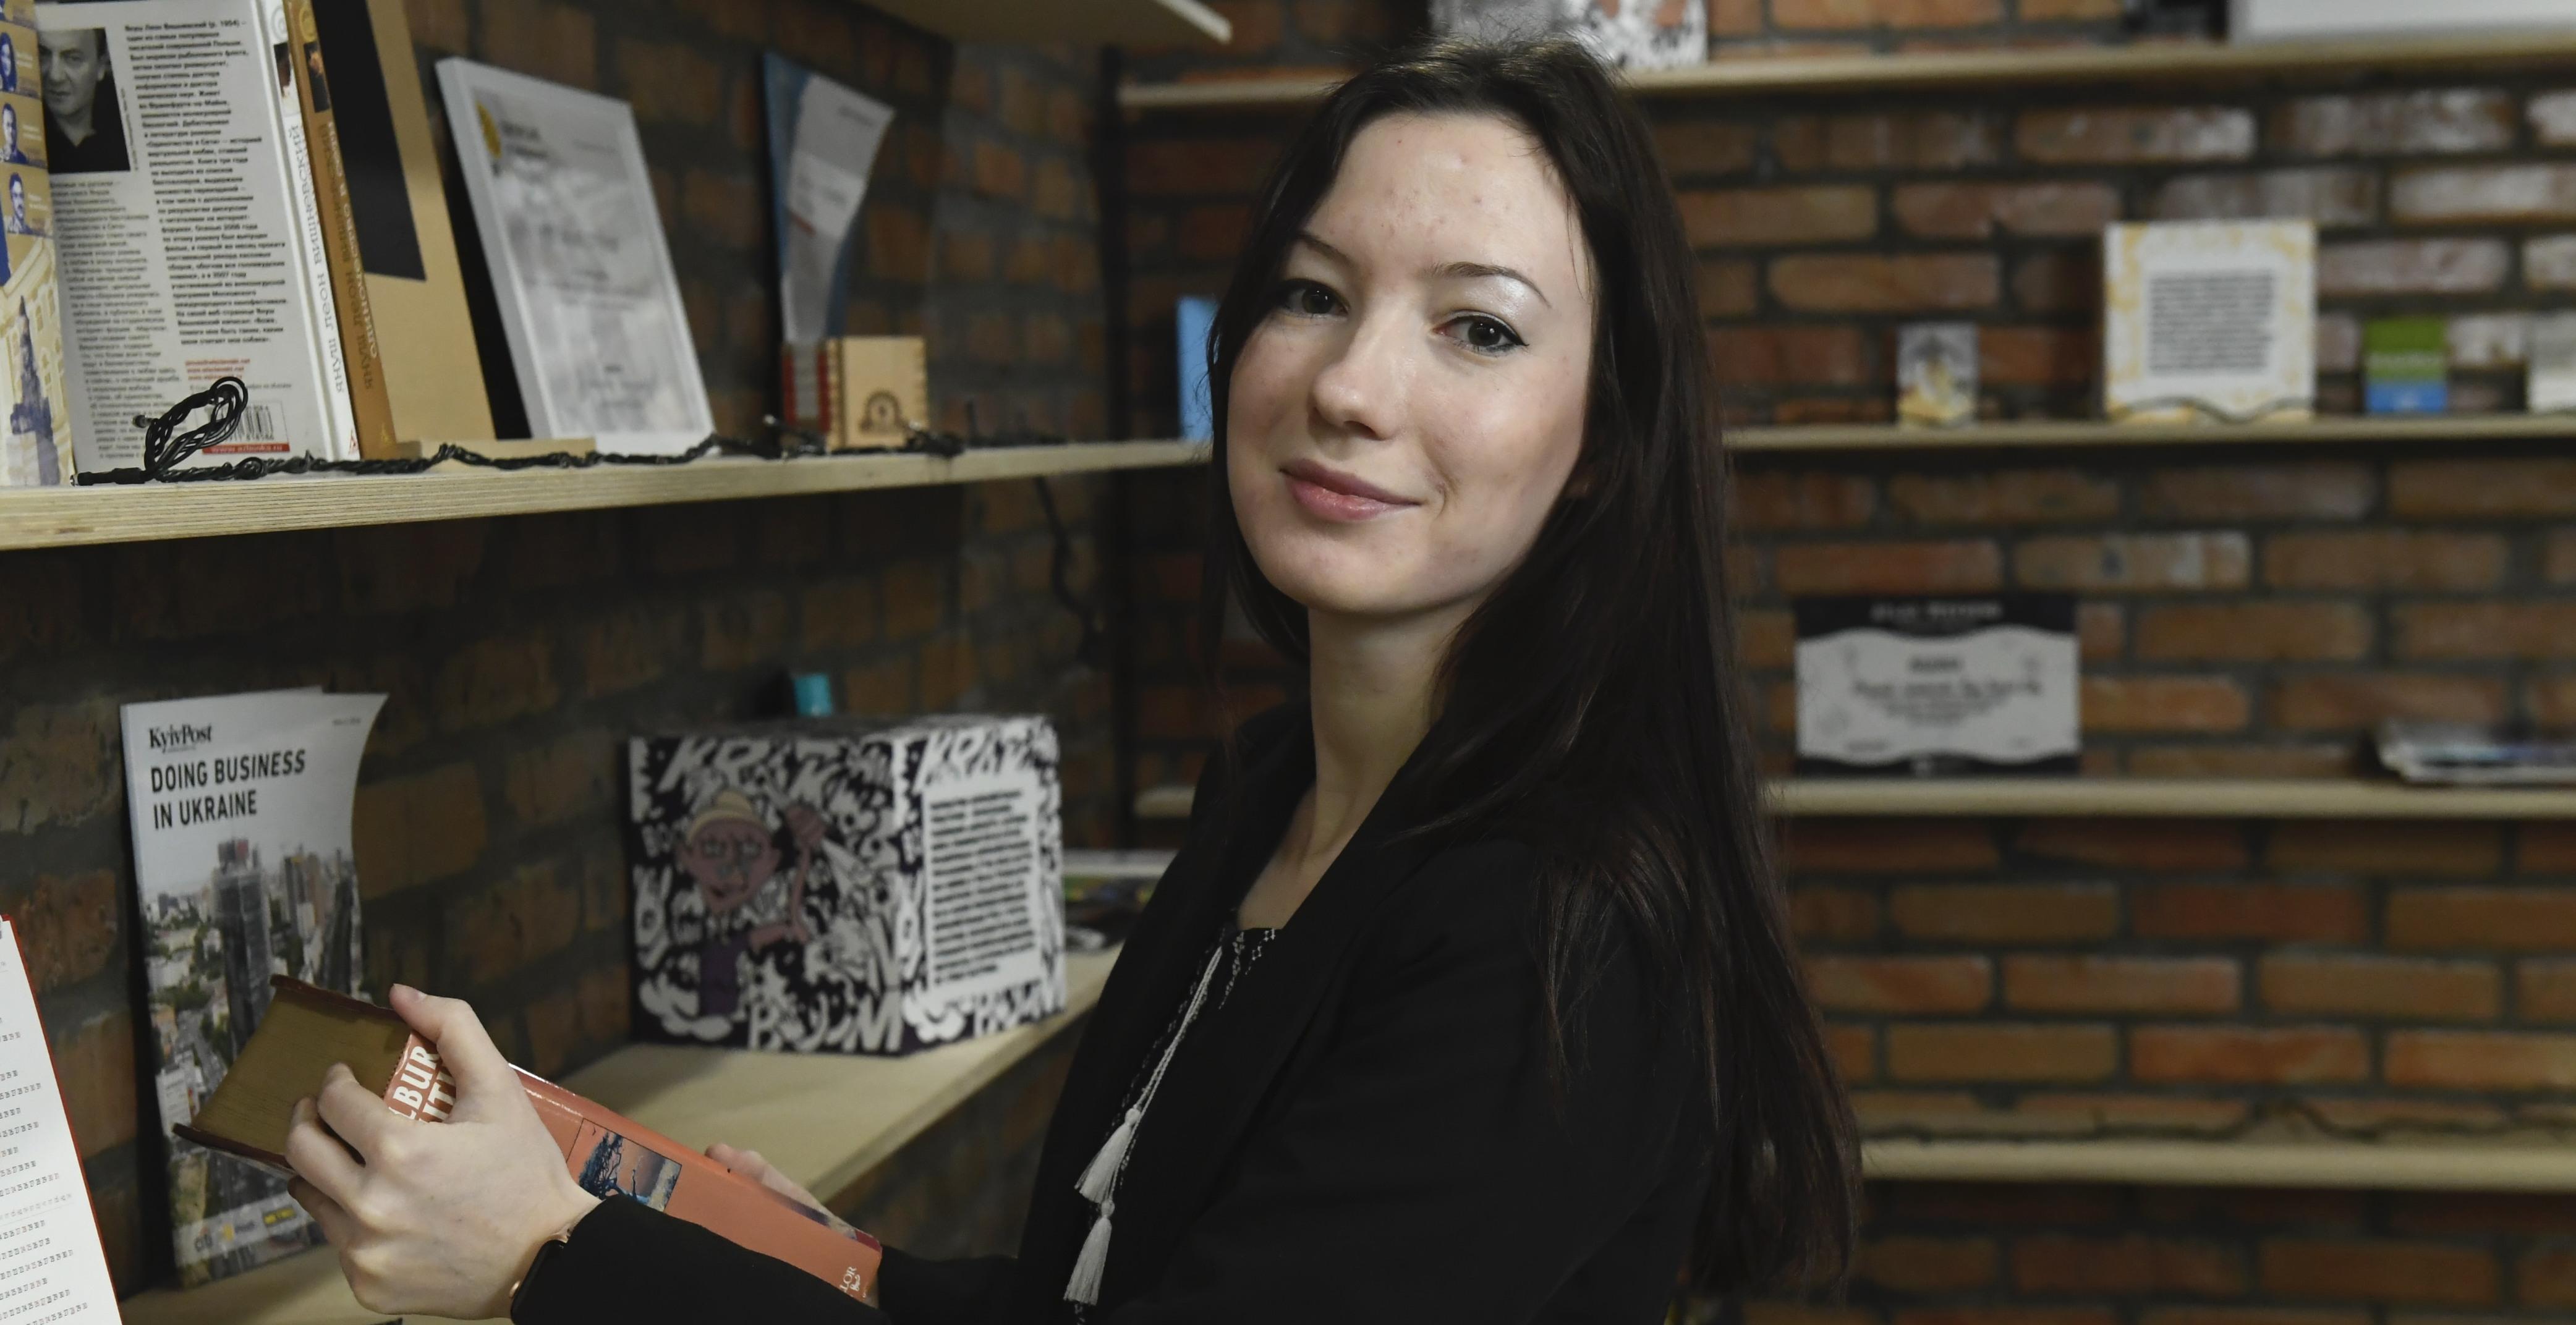 Karyna Litvinova